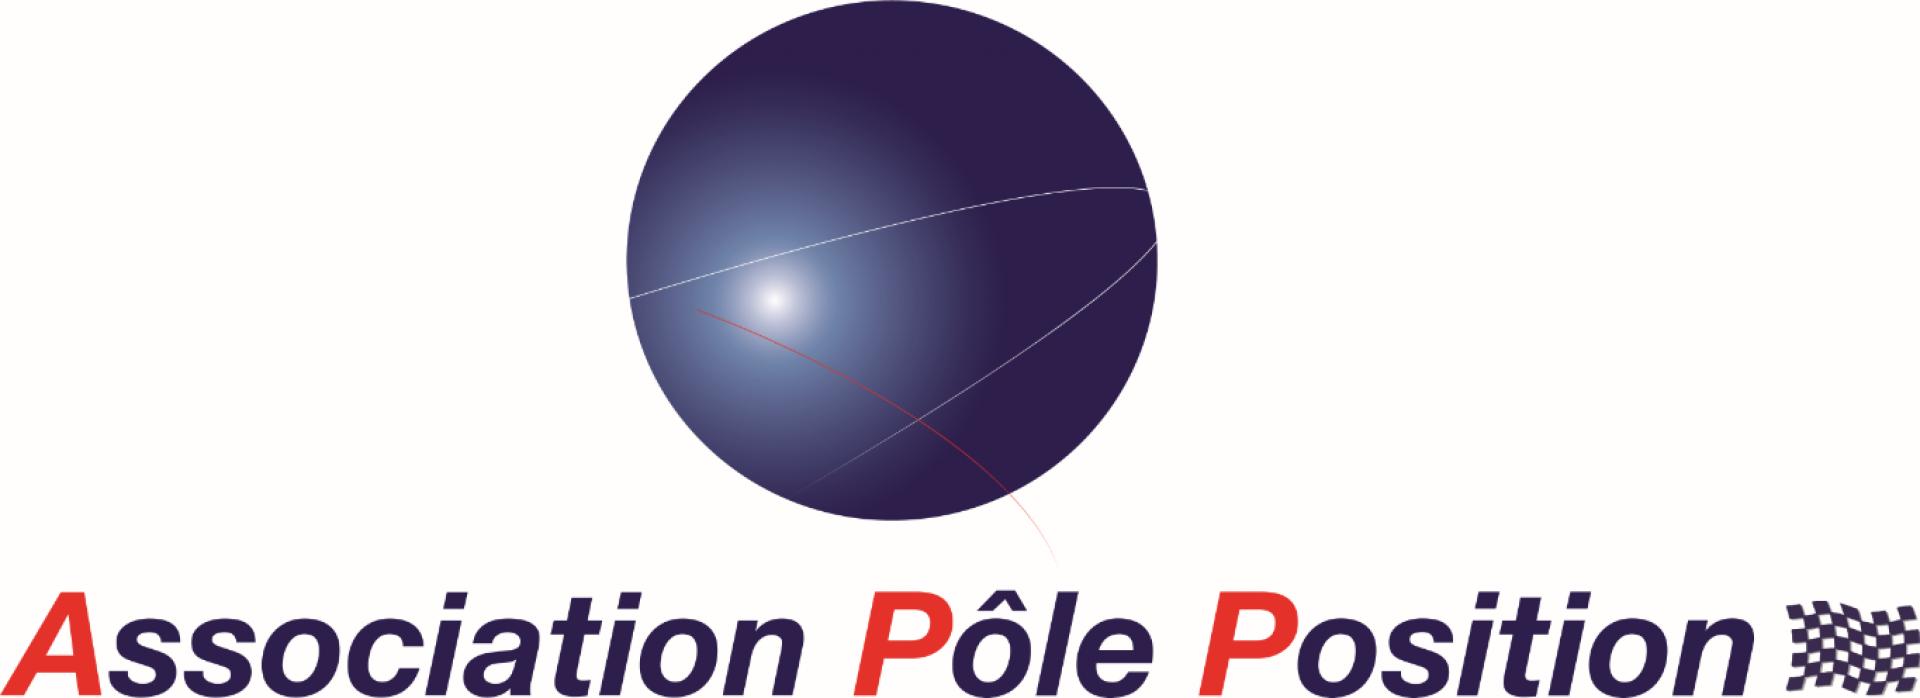 Association Pole Position (ASPP) logo